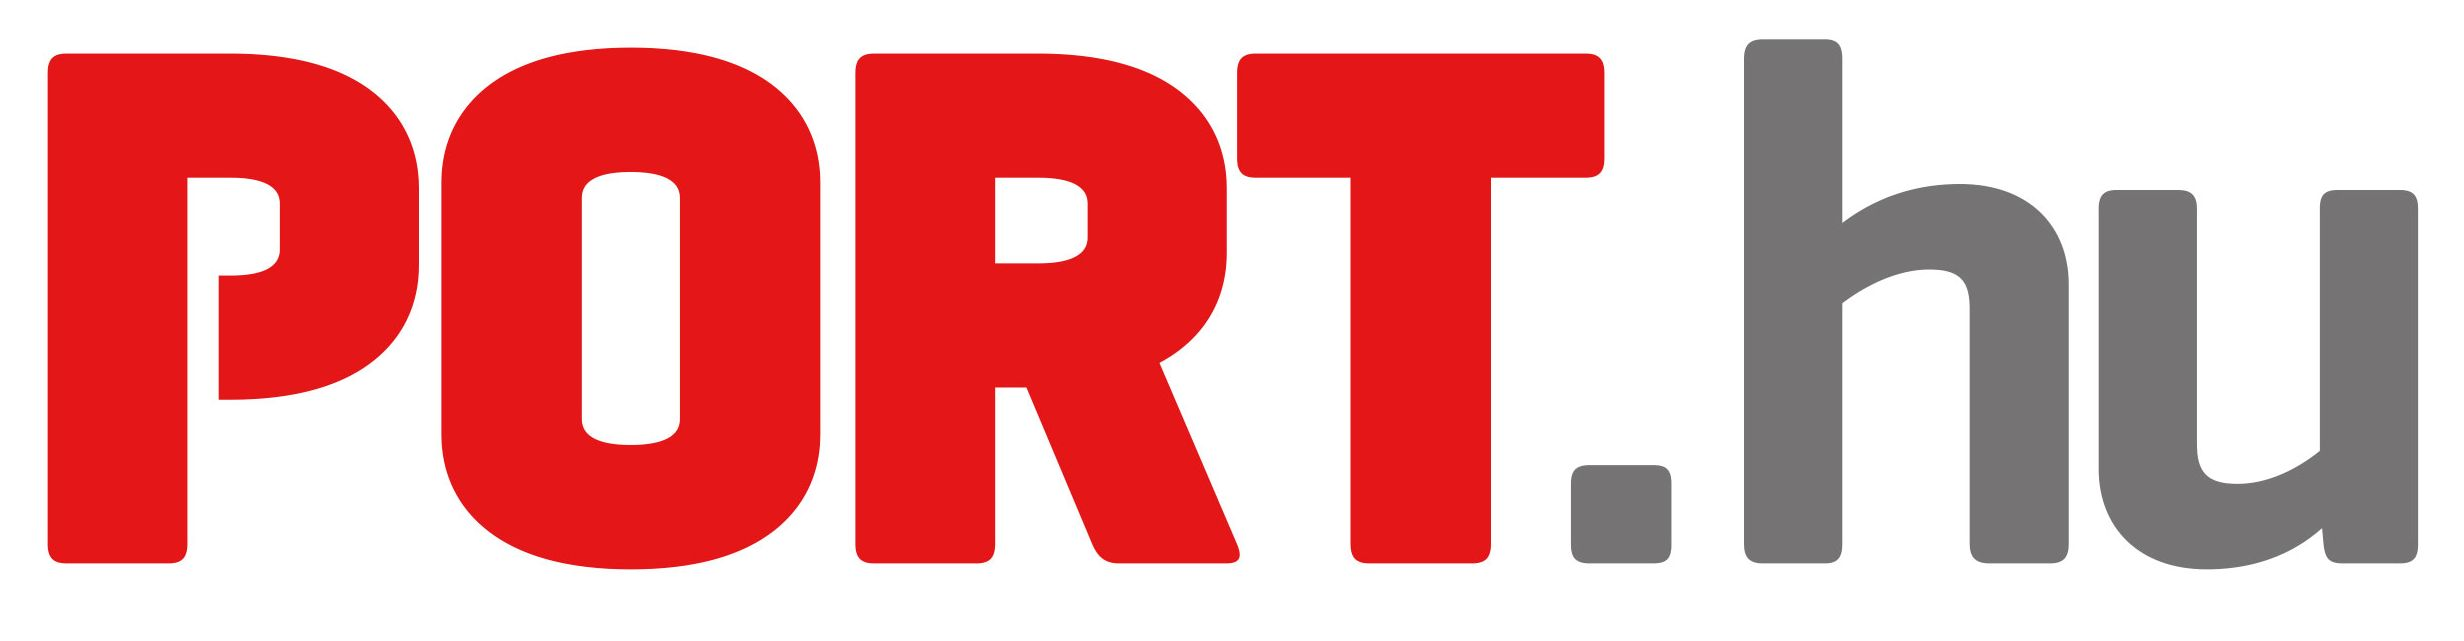 port_hu_logo.png